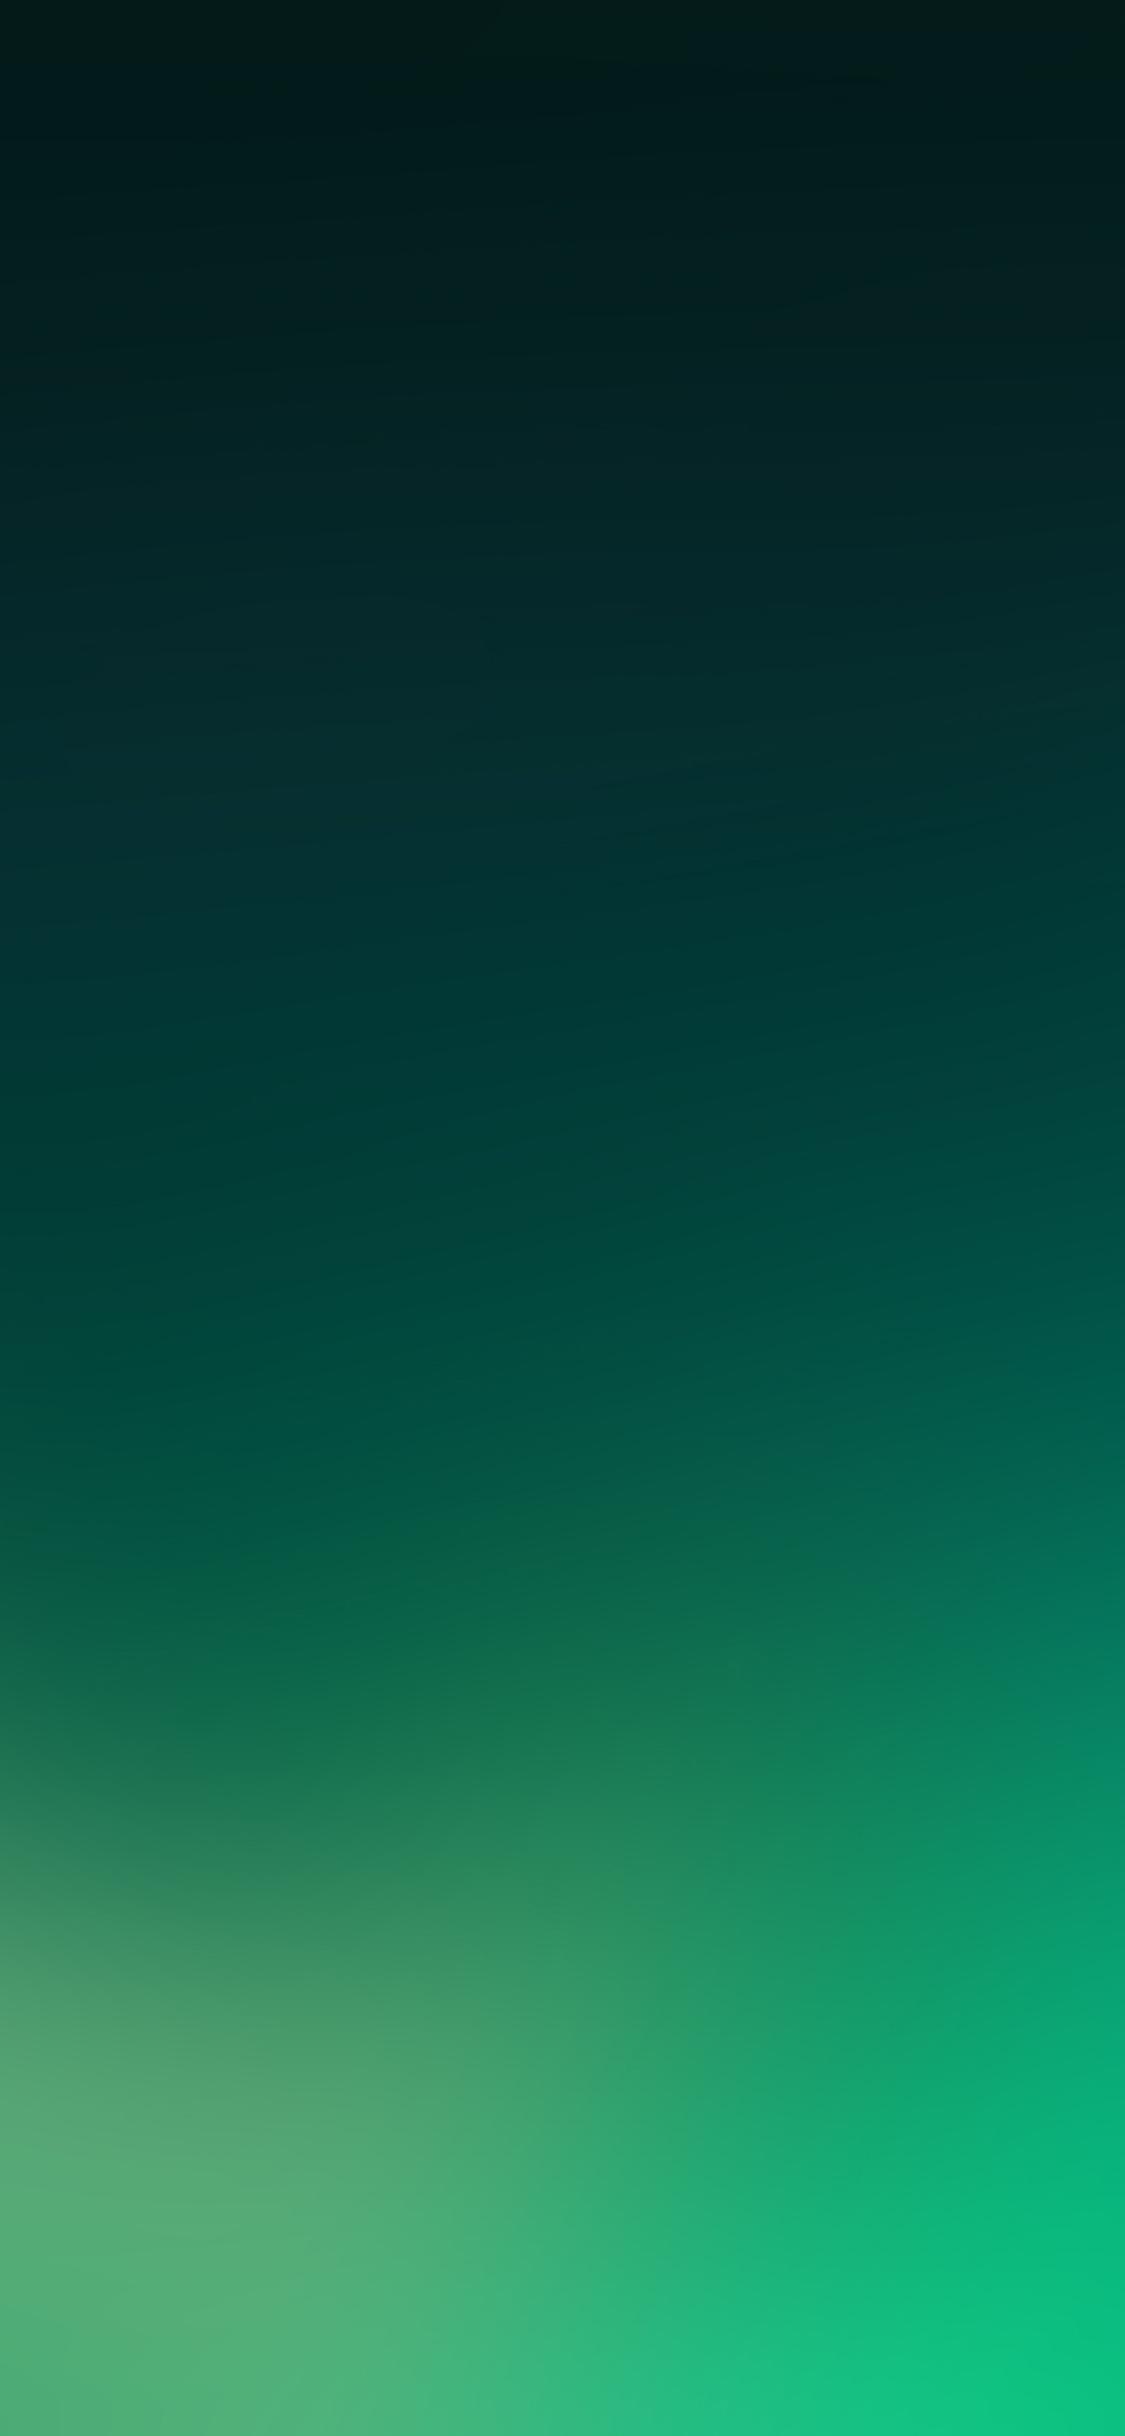 iPhoneXpapers.com-Apple-iPhone-wallpaper-sb30-wallpaper-galaxy-blue-7-starry-star-sky-blur